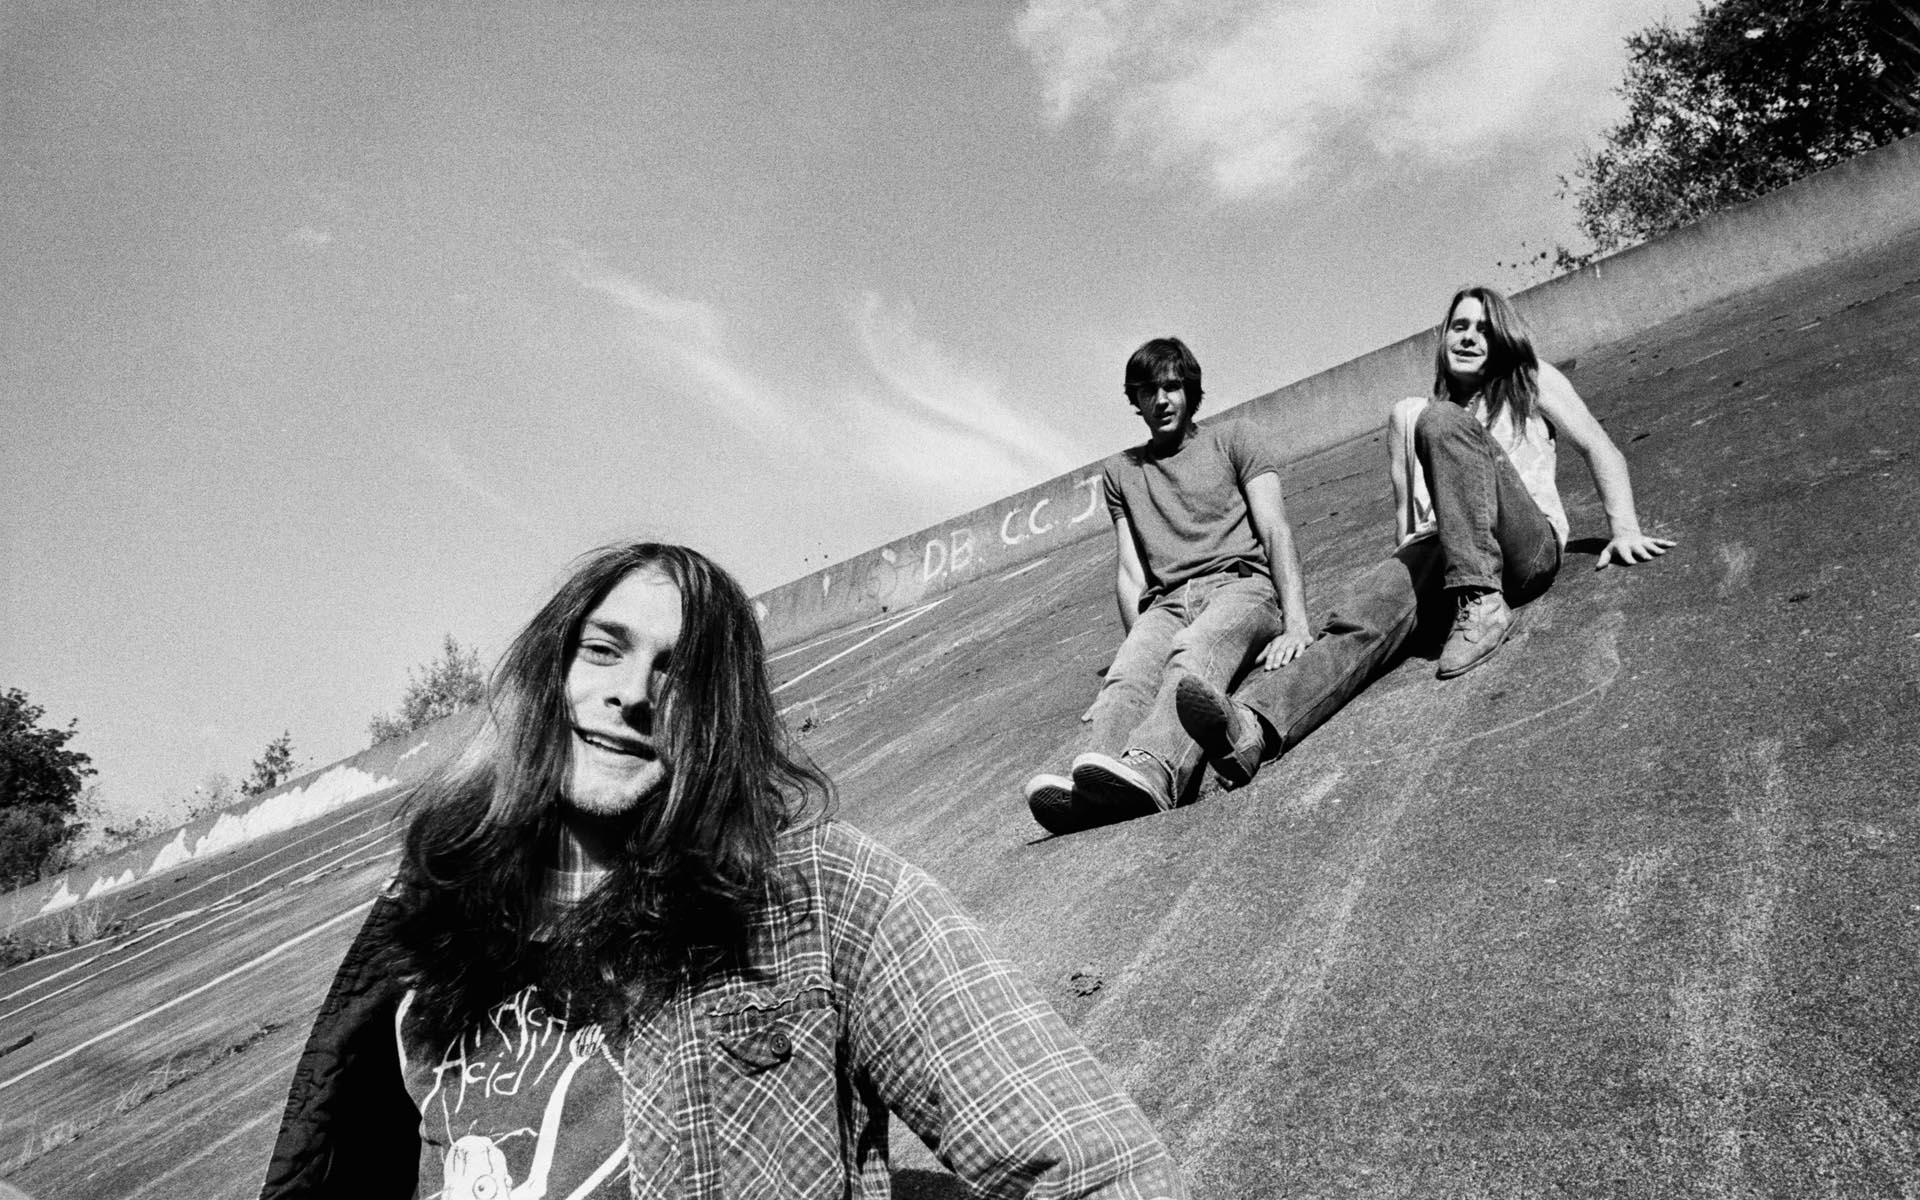 Deadpool Nirvana Wallpaper - WallpaperSafari